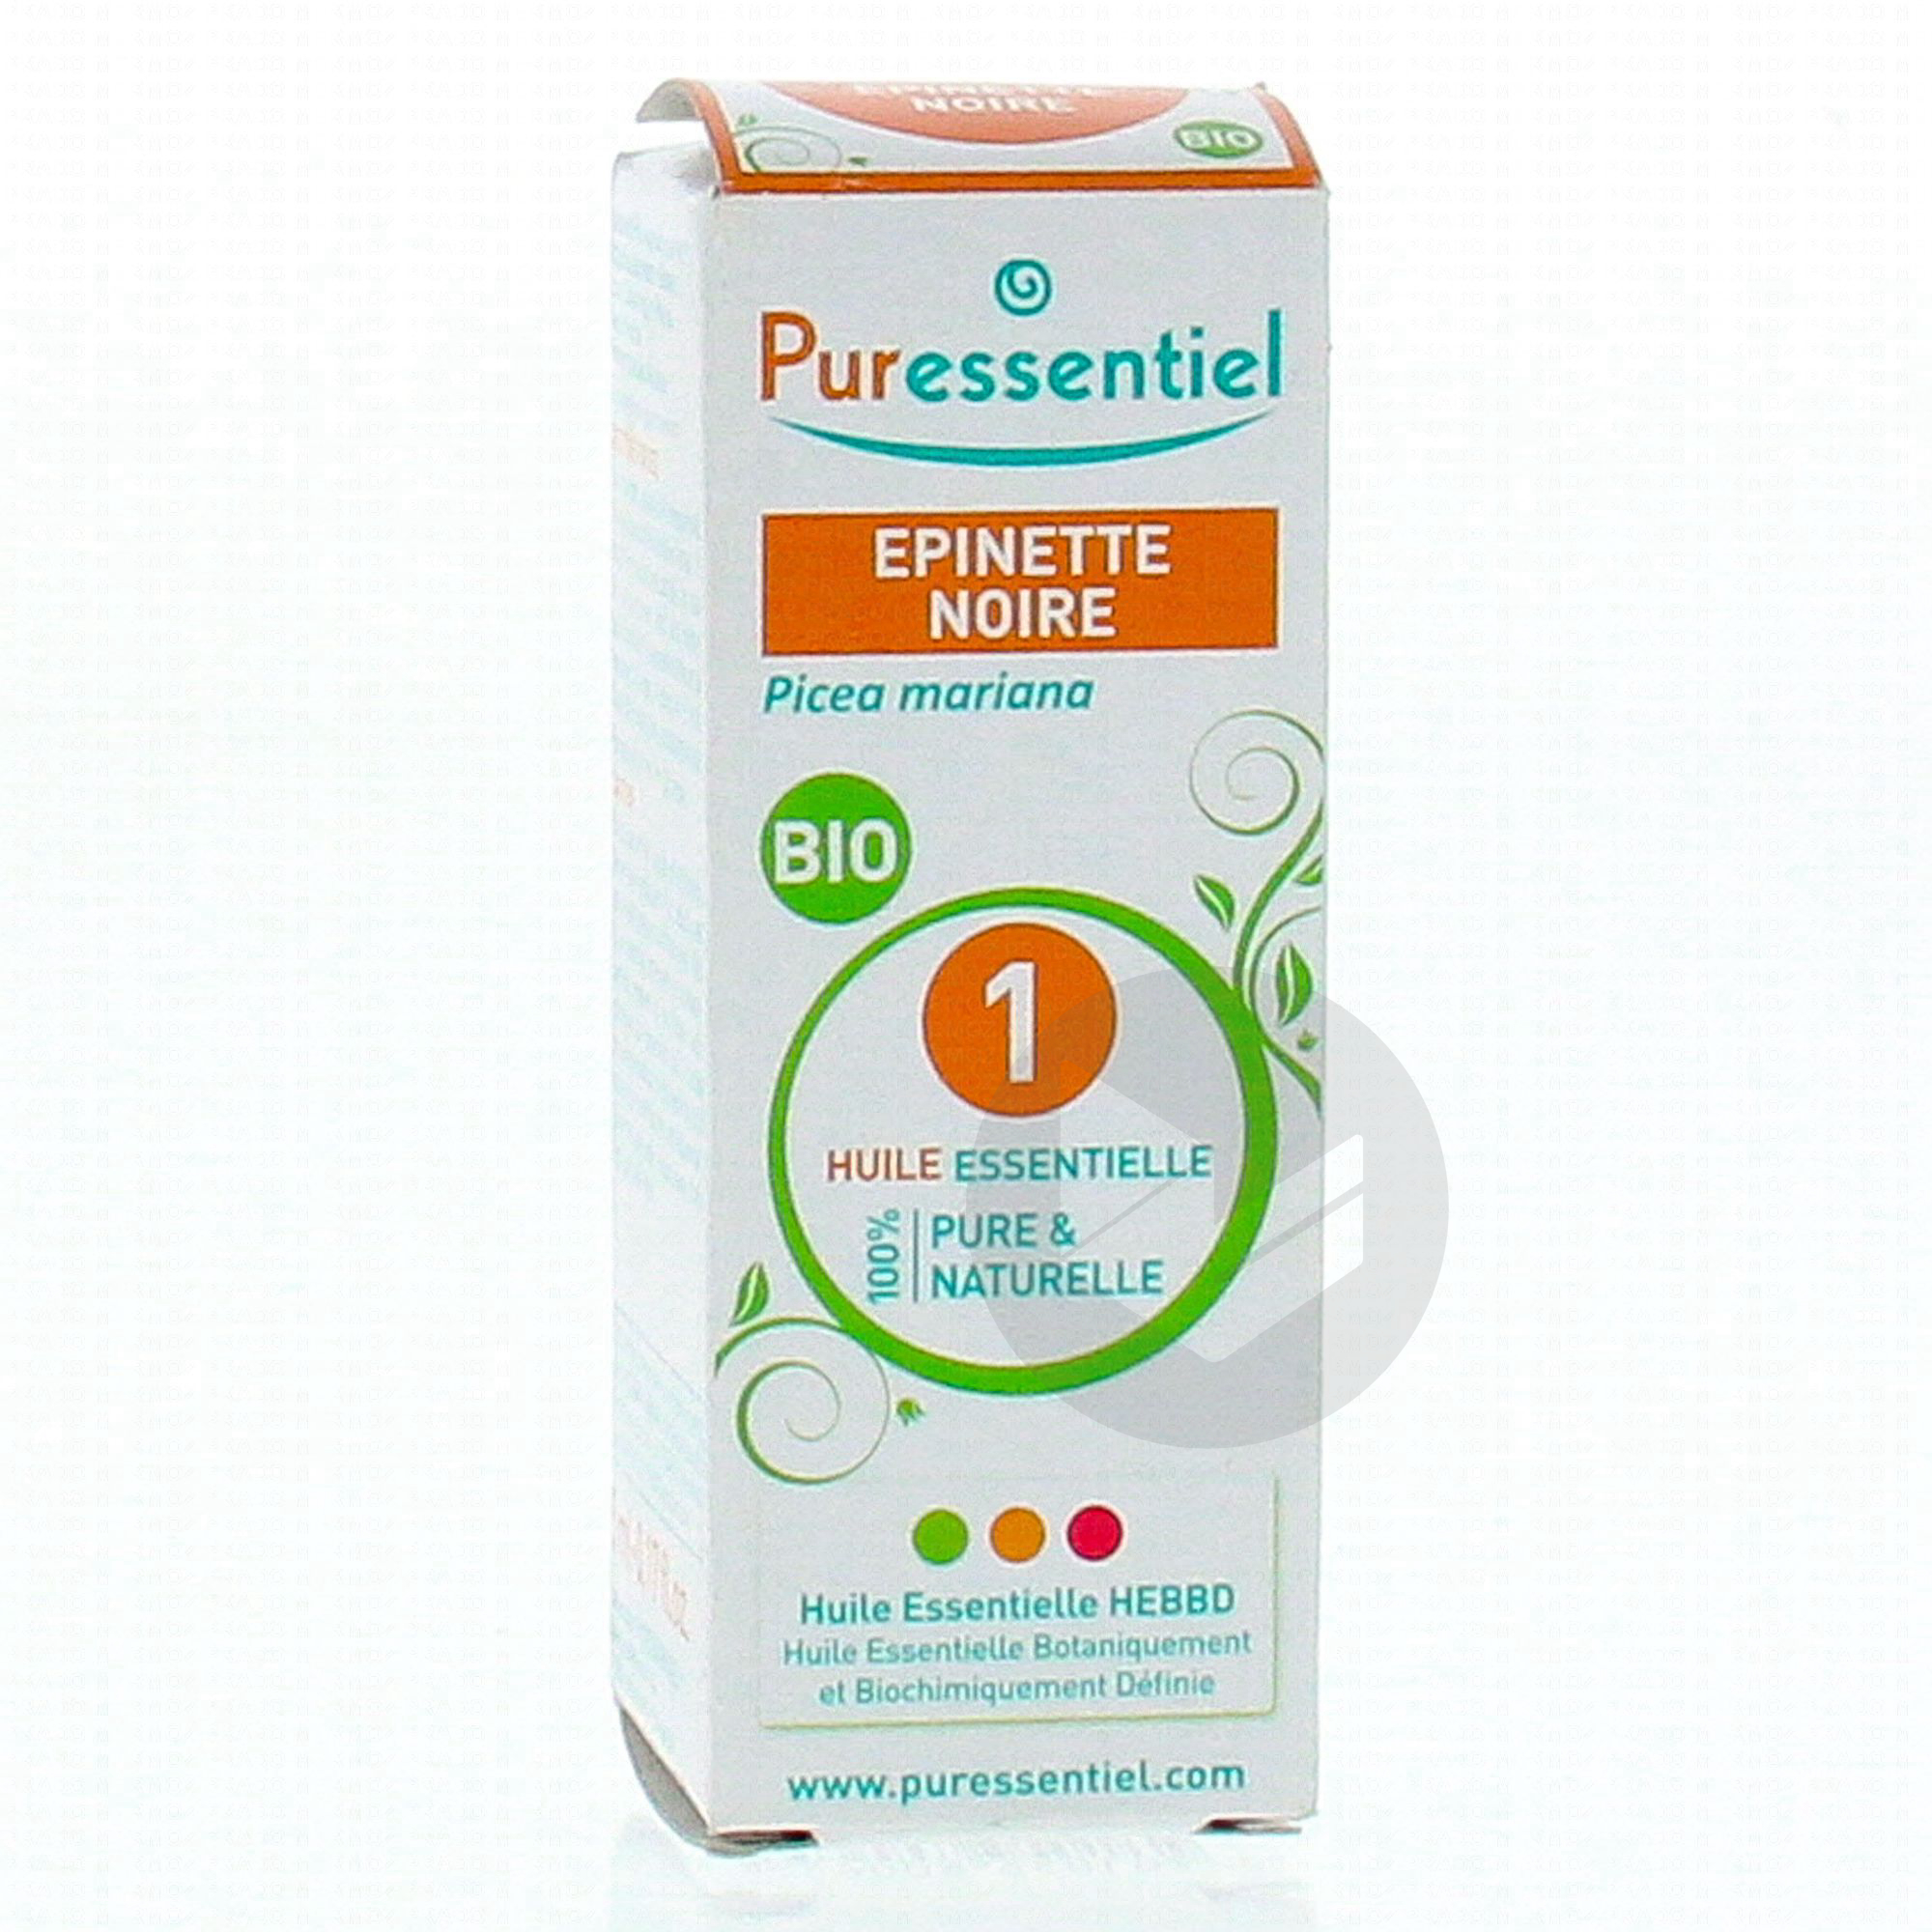 Puressentiel huile essentielle Epinette noire bio 5ml